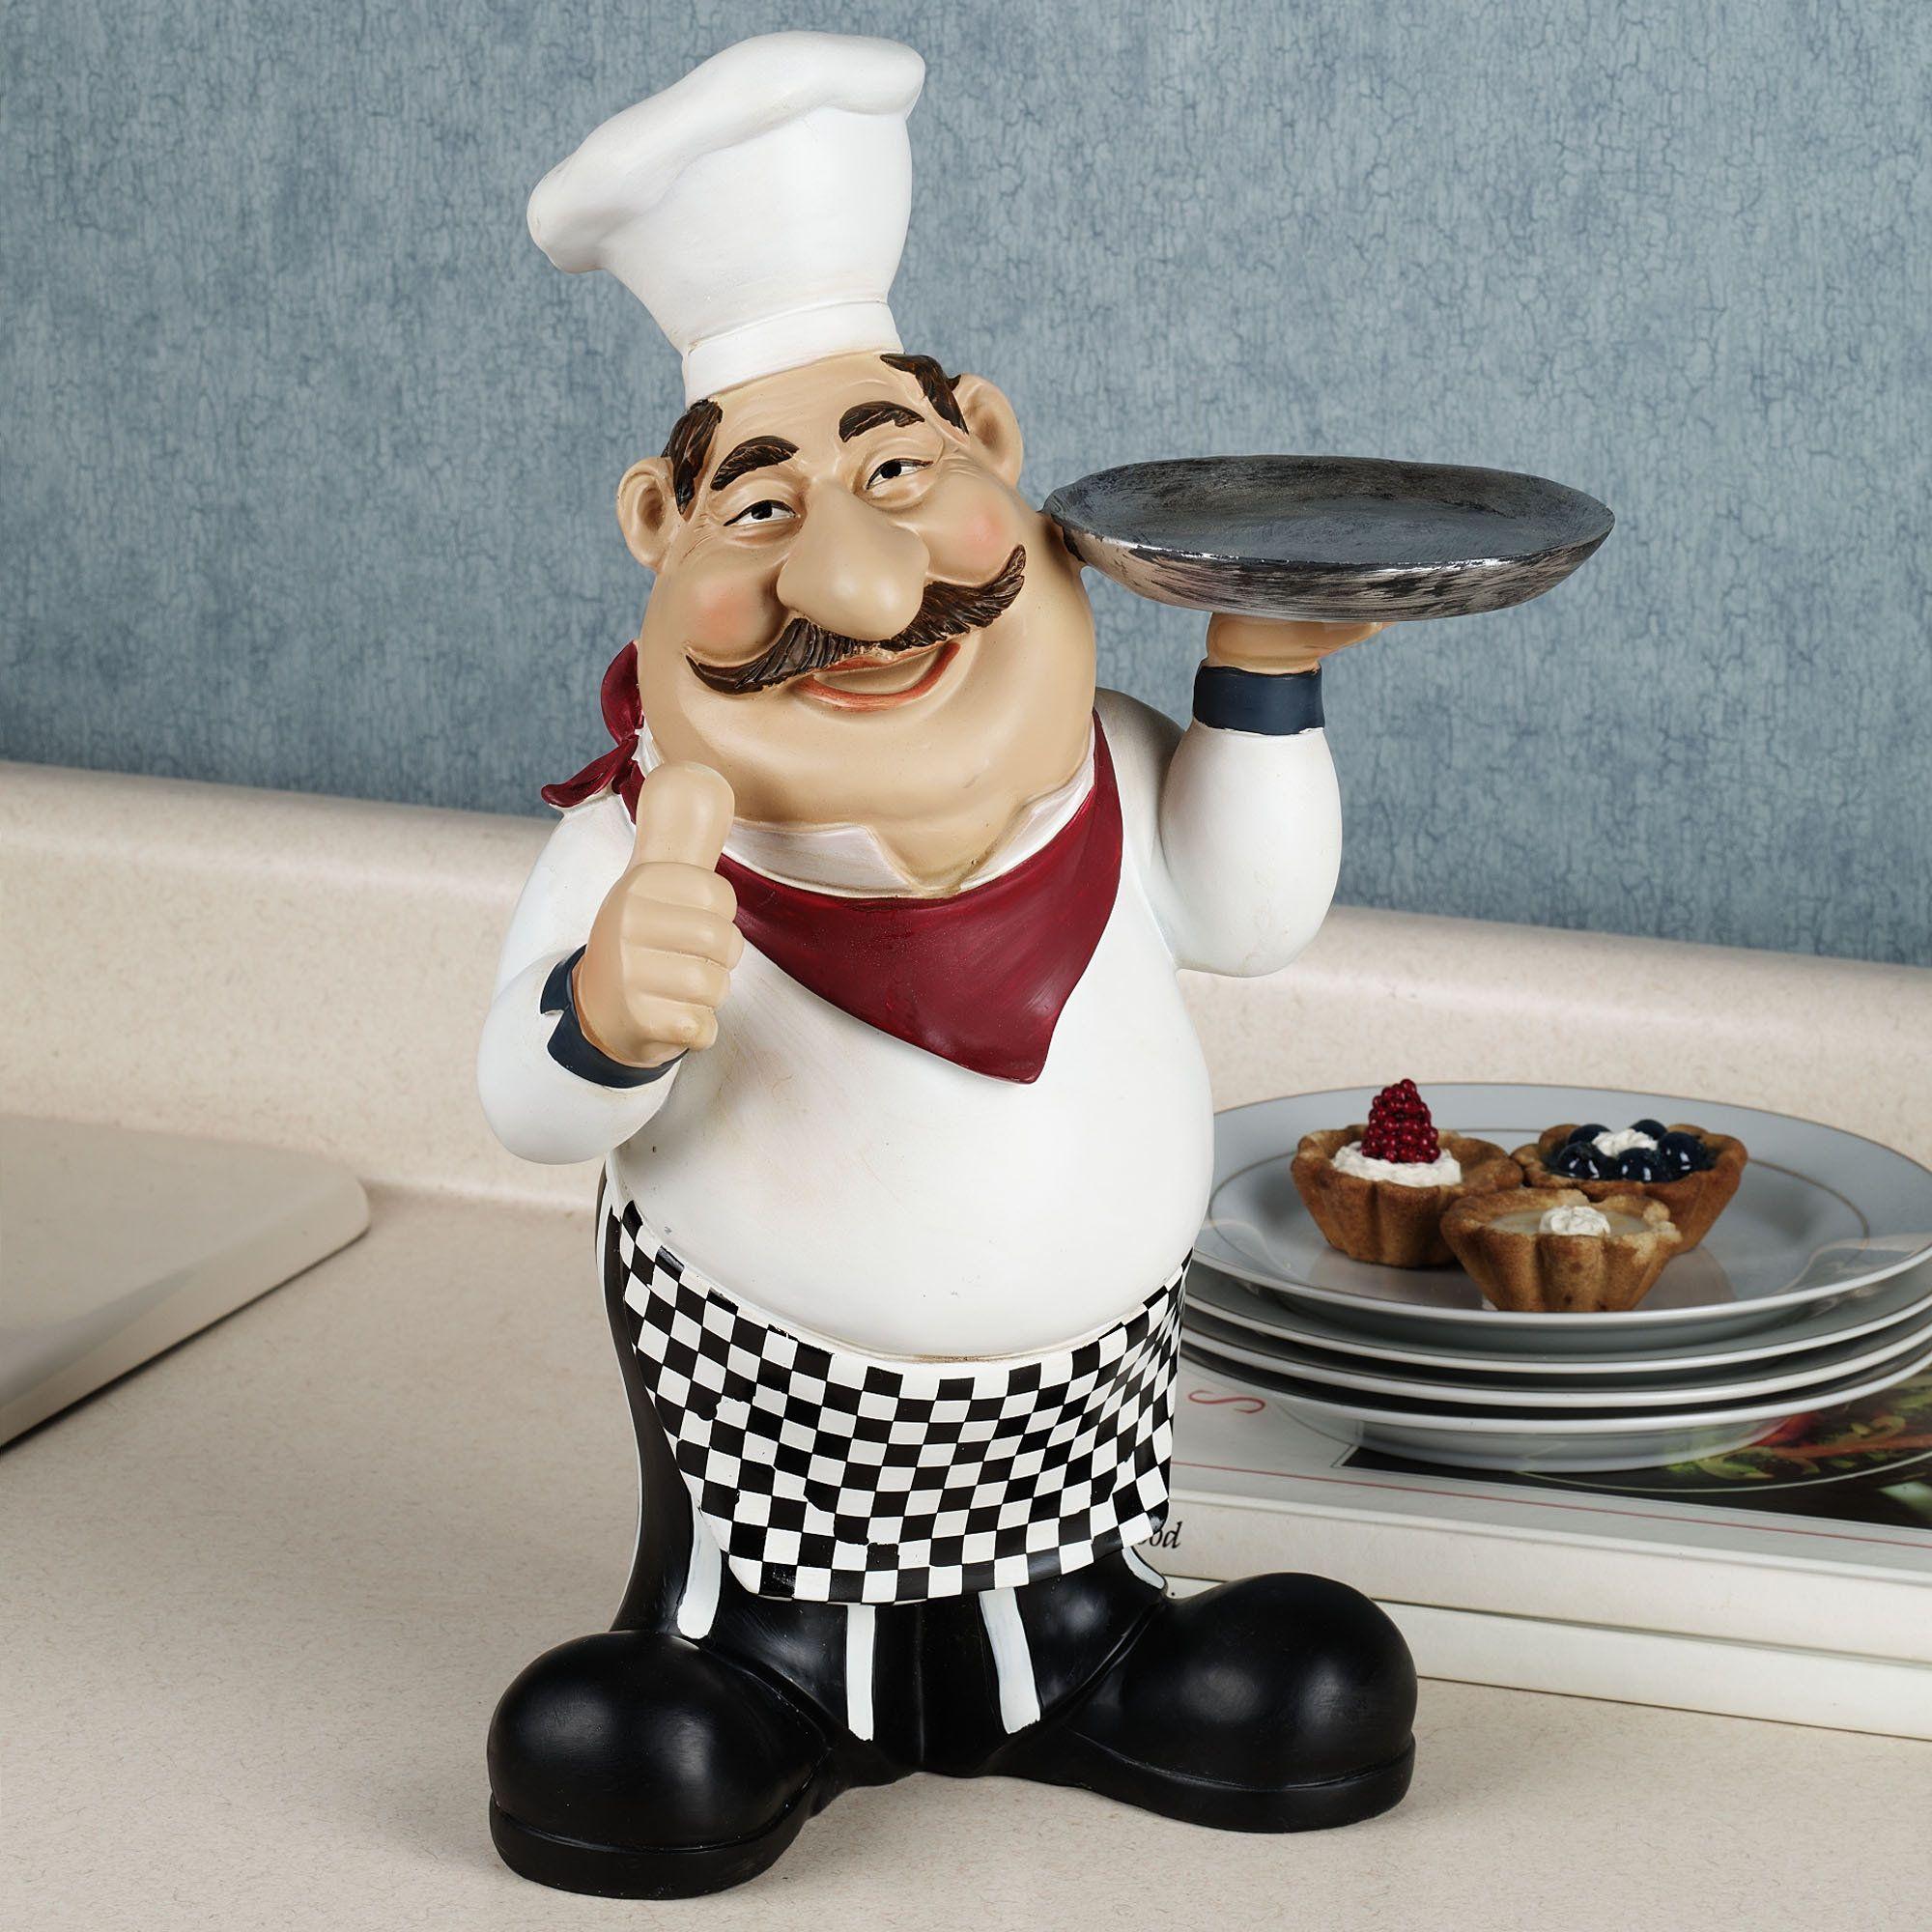 chef de cuisine sculpture chef s pinterest clay sculptures